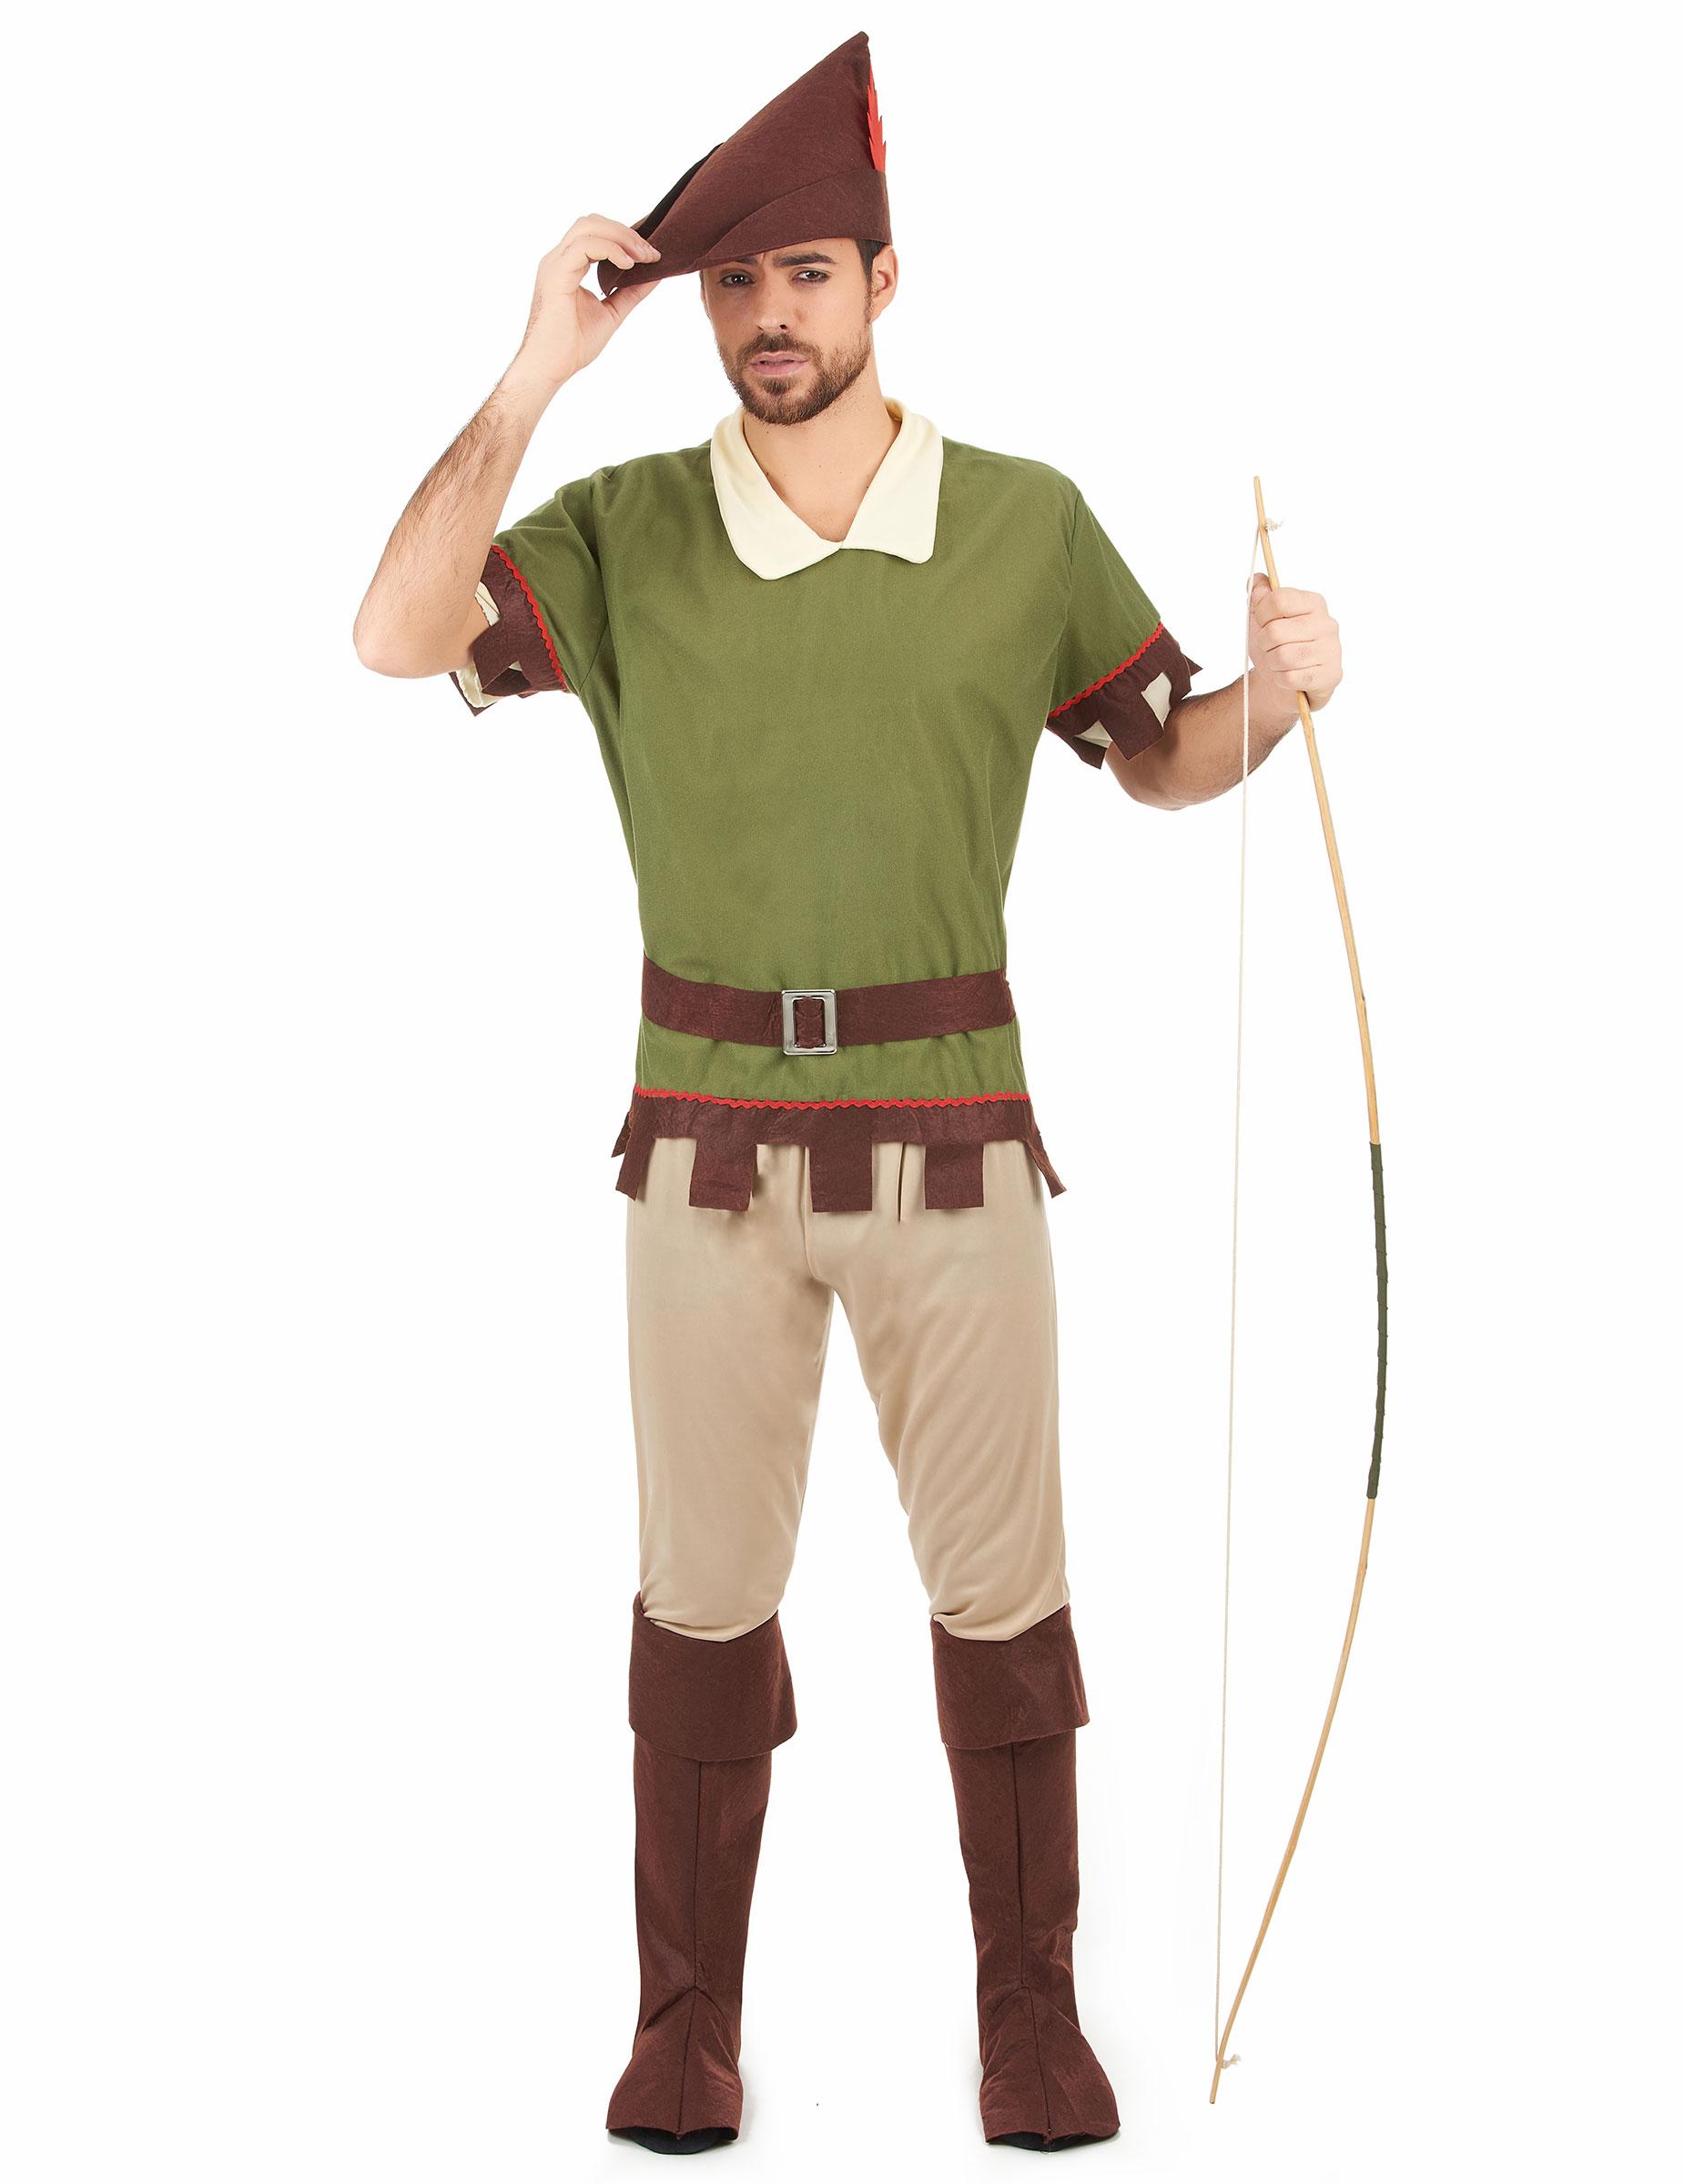 Kostüme Für Erwachsene Filmstars Promis Peter Pan Kostüme Shoppen